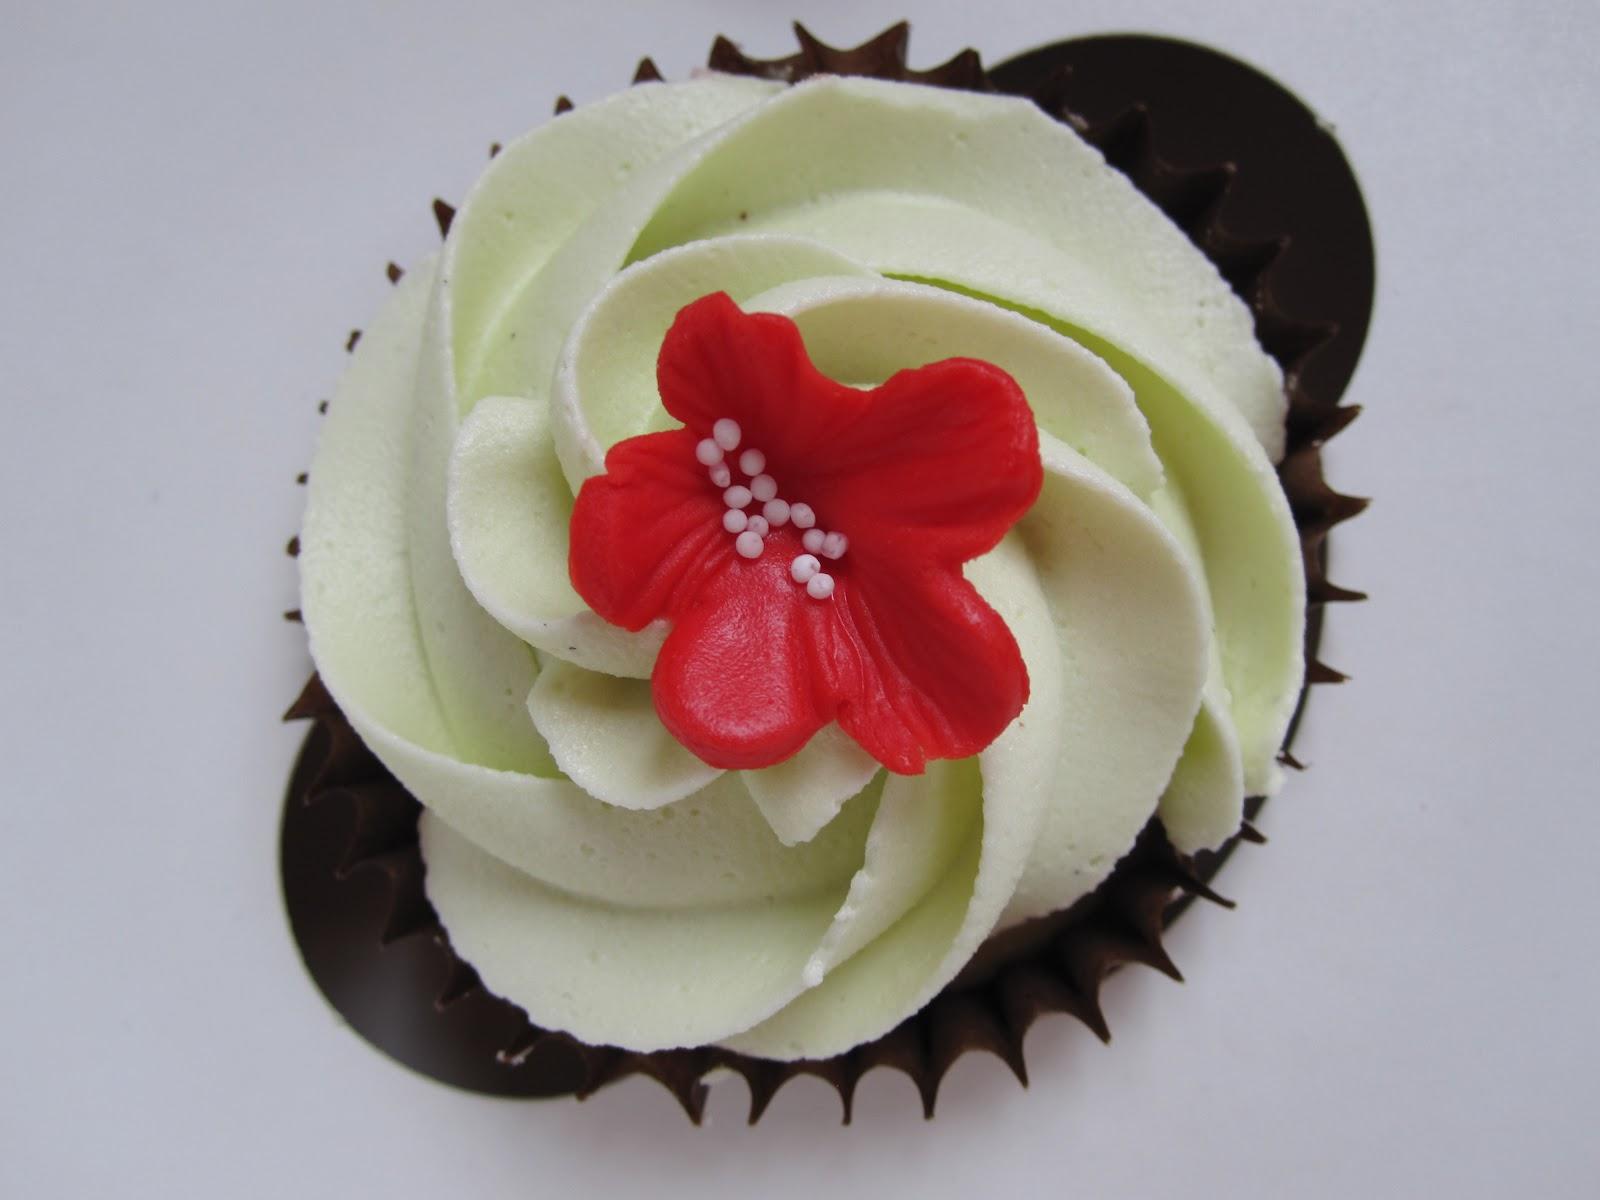 Treatz Red Velvet Fudge Cake